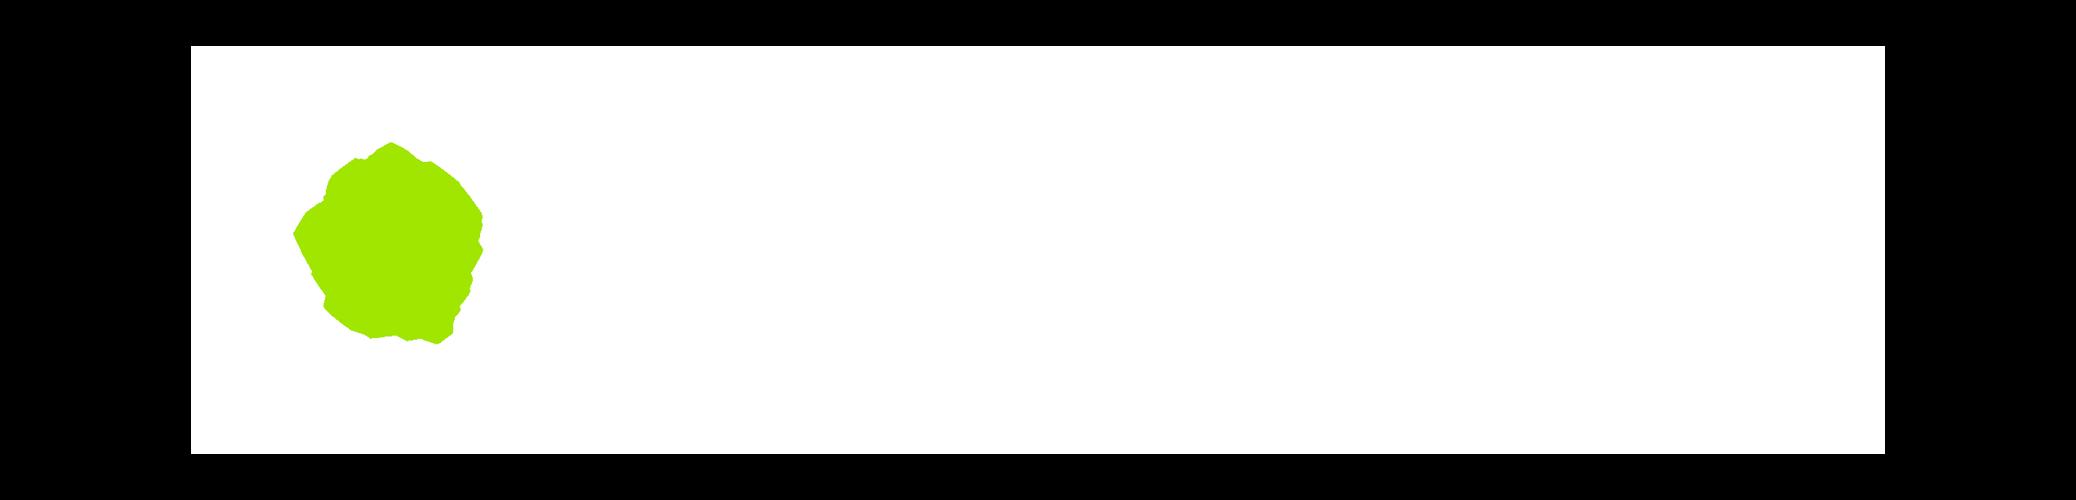 Jackson Dodds & Company Inc